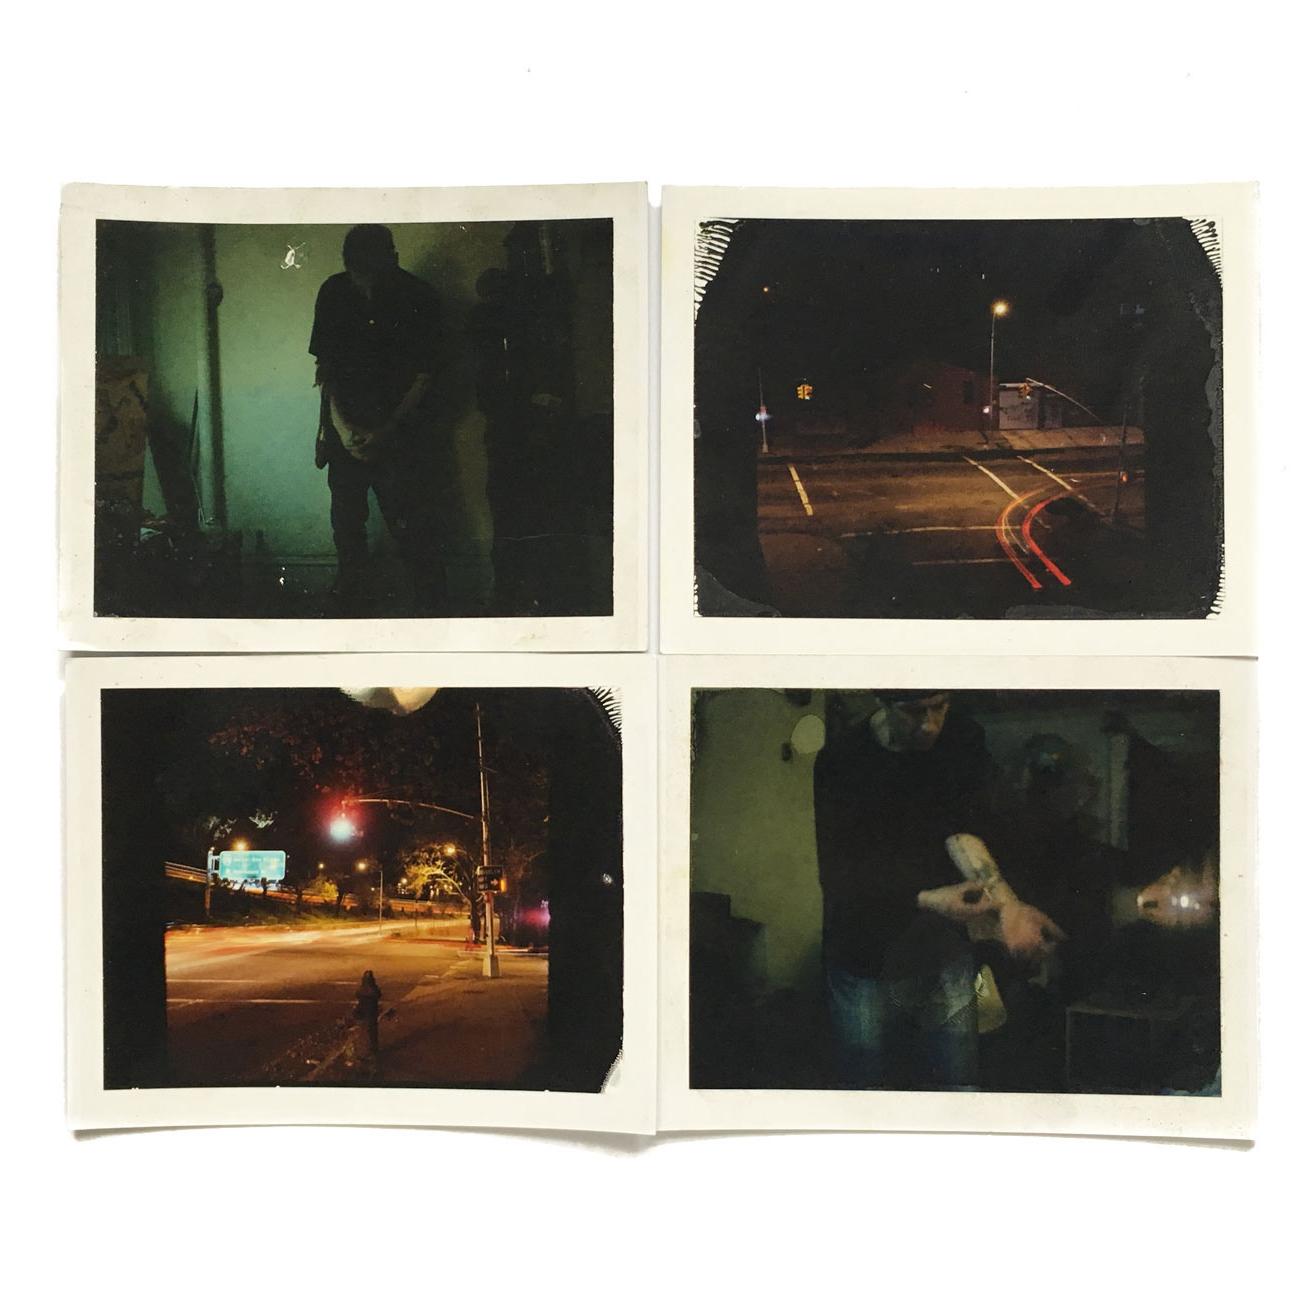 Images by Graham MacIndoe